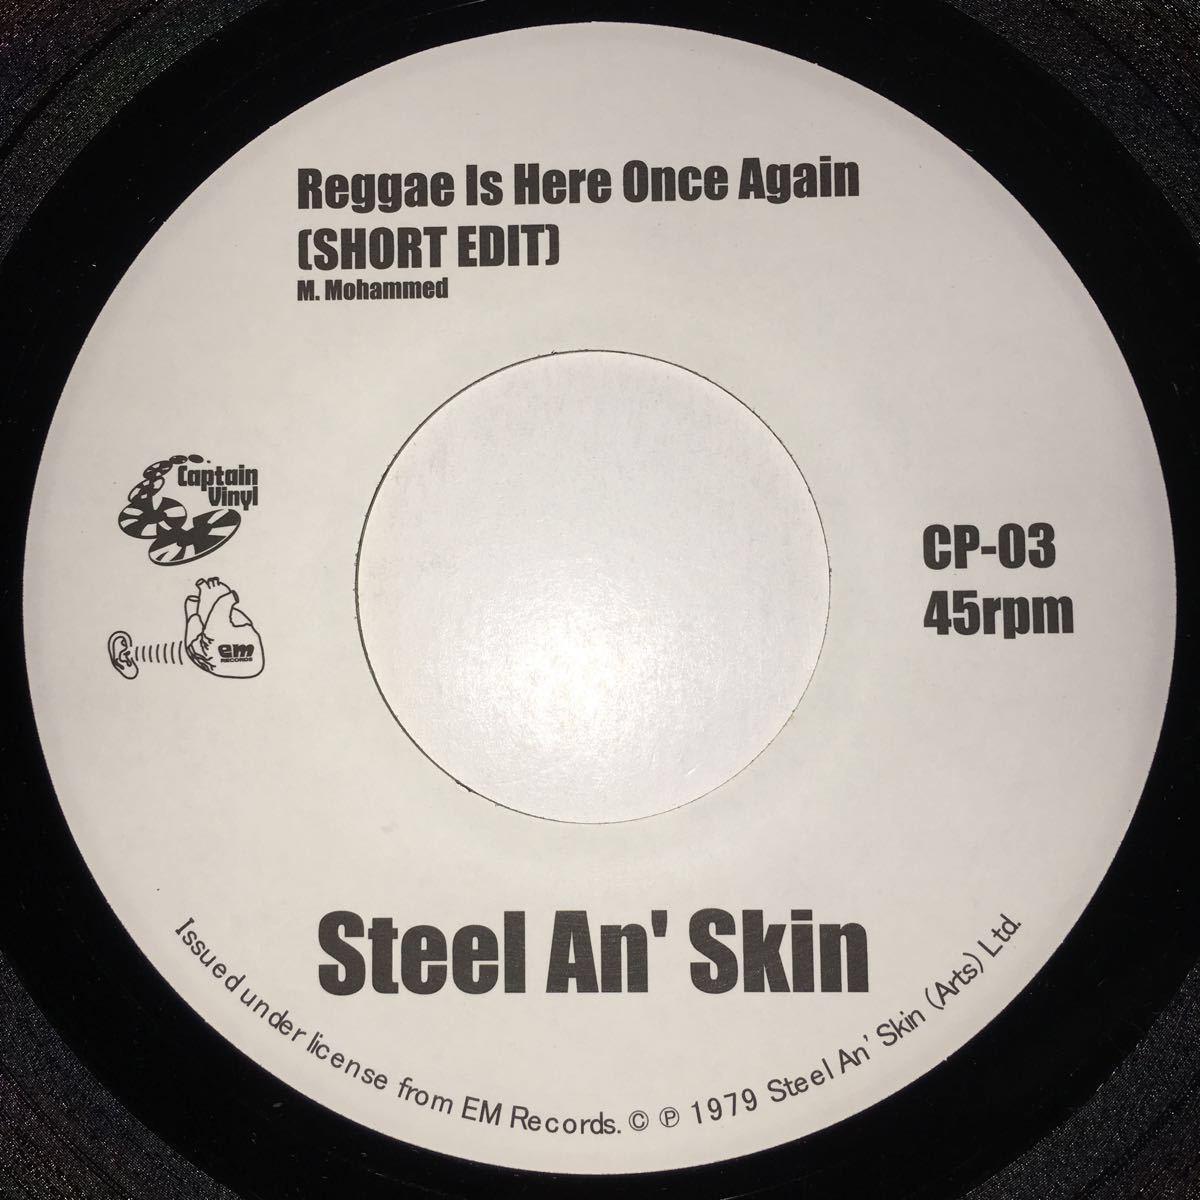 Steel An' Skin - Reggae Is Here Once Again [short edit] // 7インチ 300枚限定 レコード ep ディスコ ブギー カリビアン スティールパン_画像1